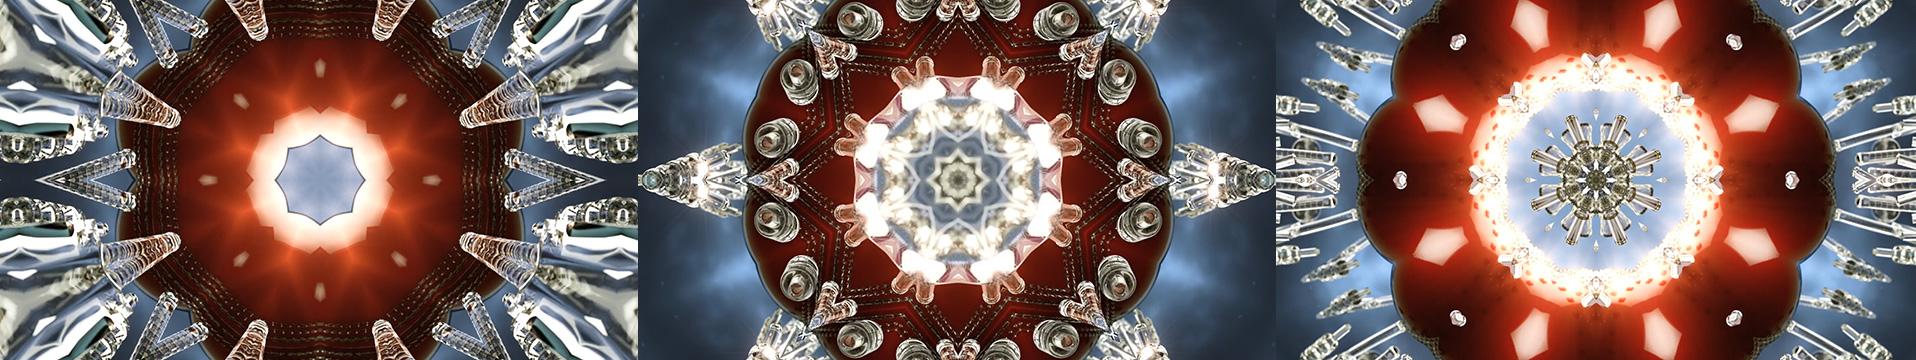 Cricket Kaleidoscope